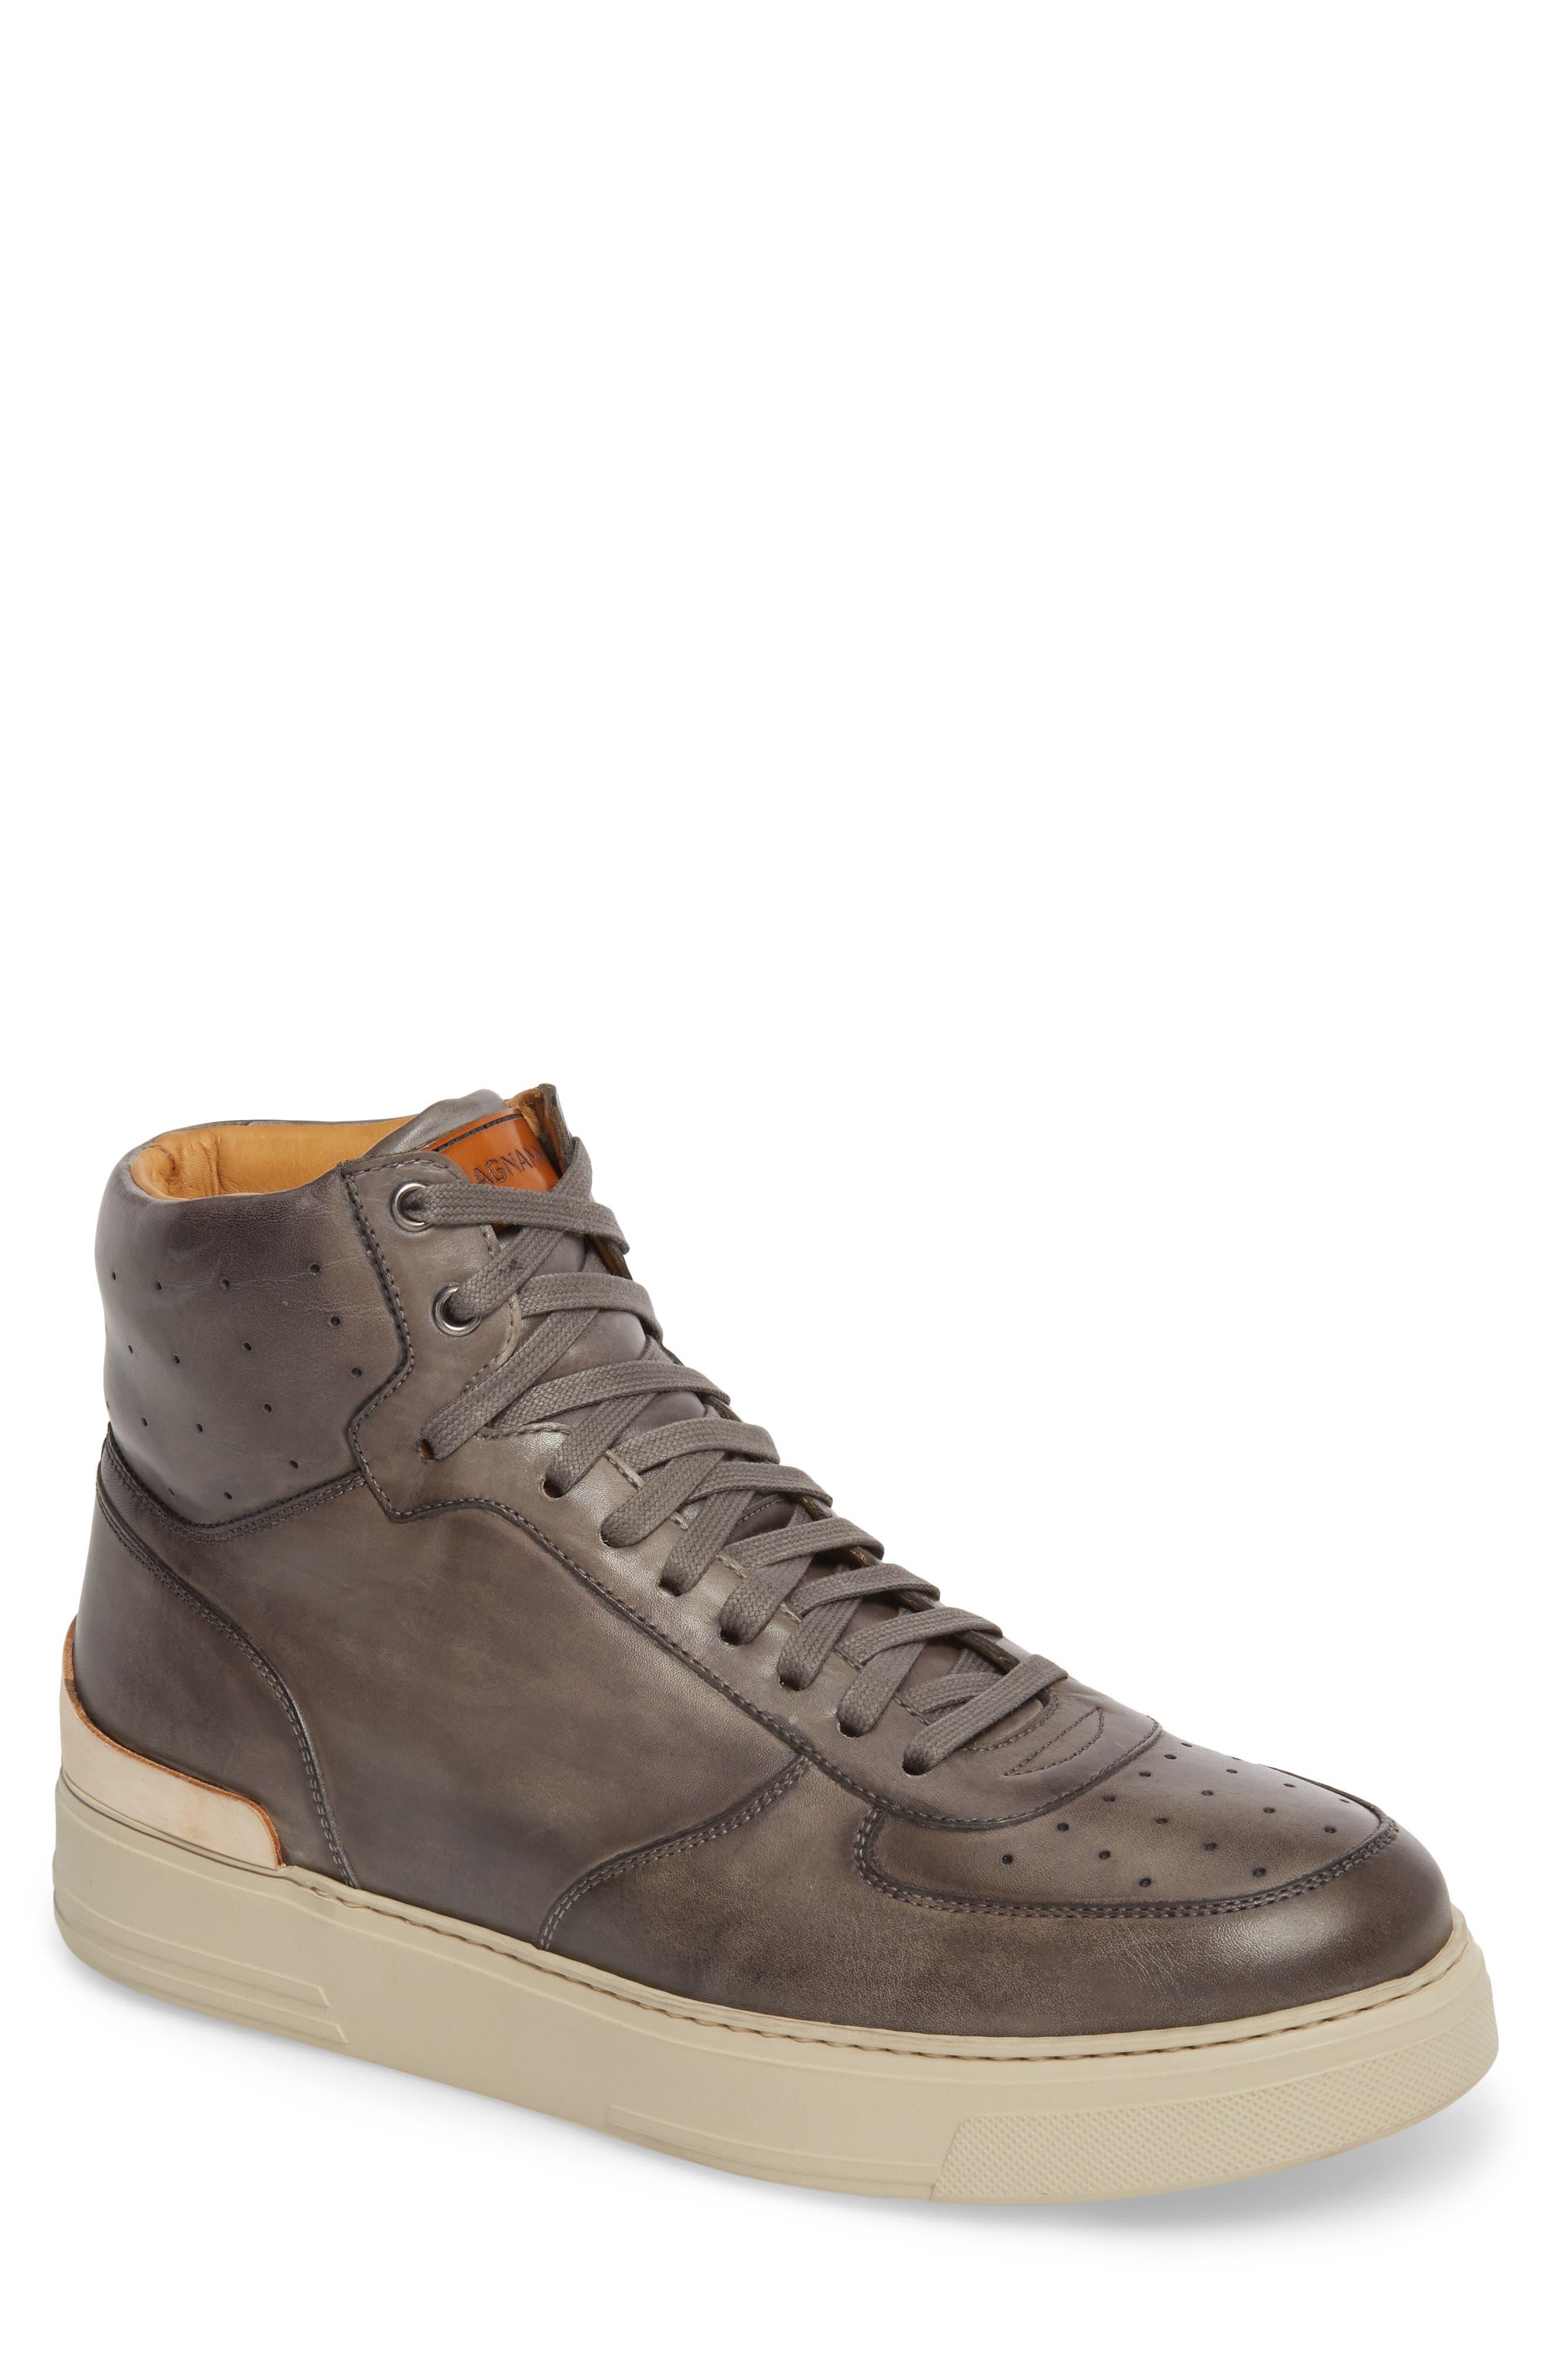 Varro Hi Top Lace Up Sneaker,                         Main,                         color,